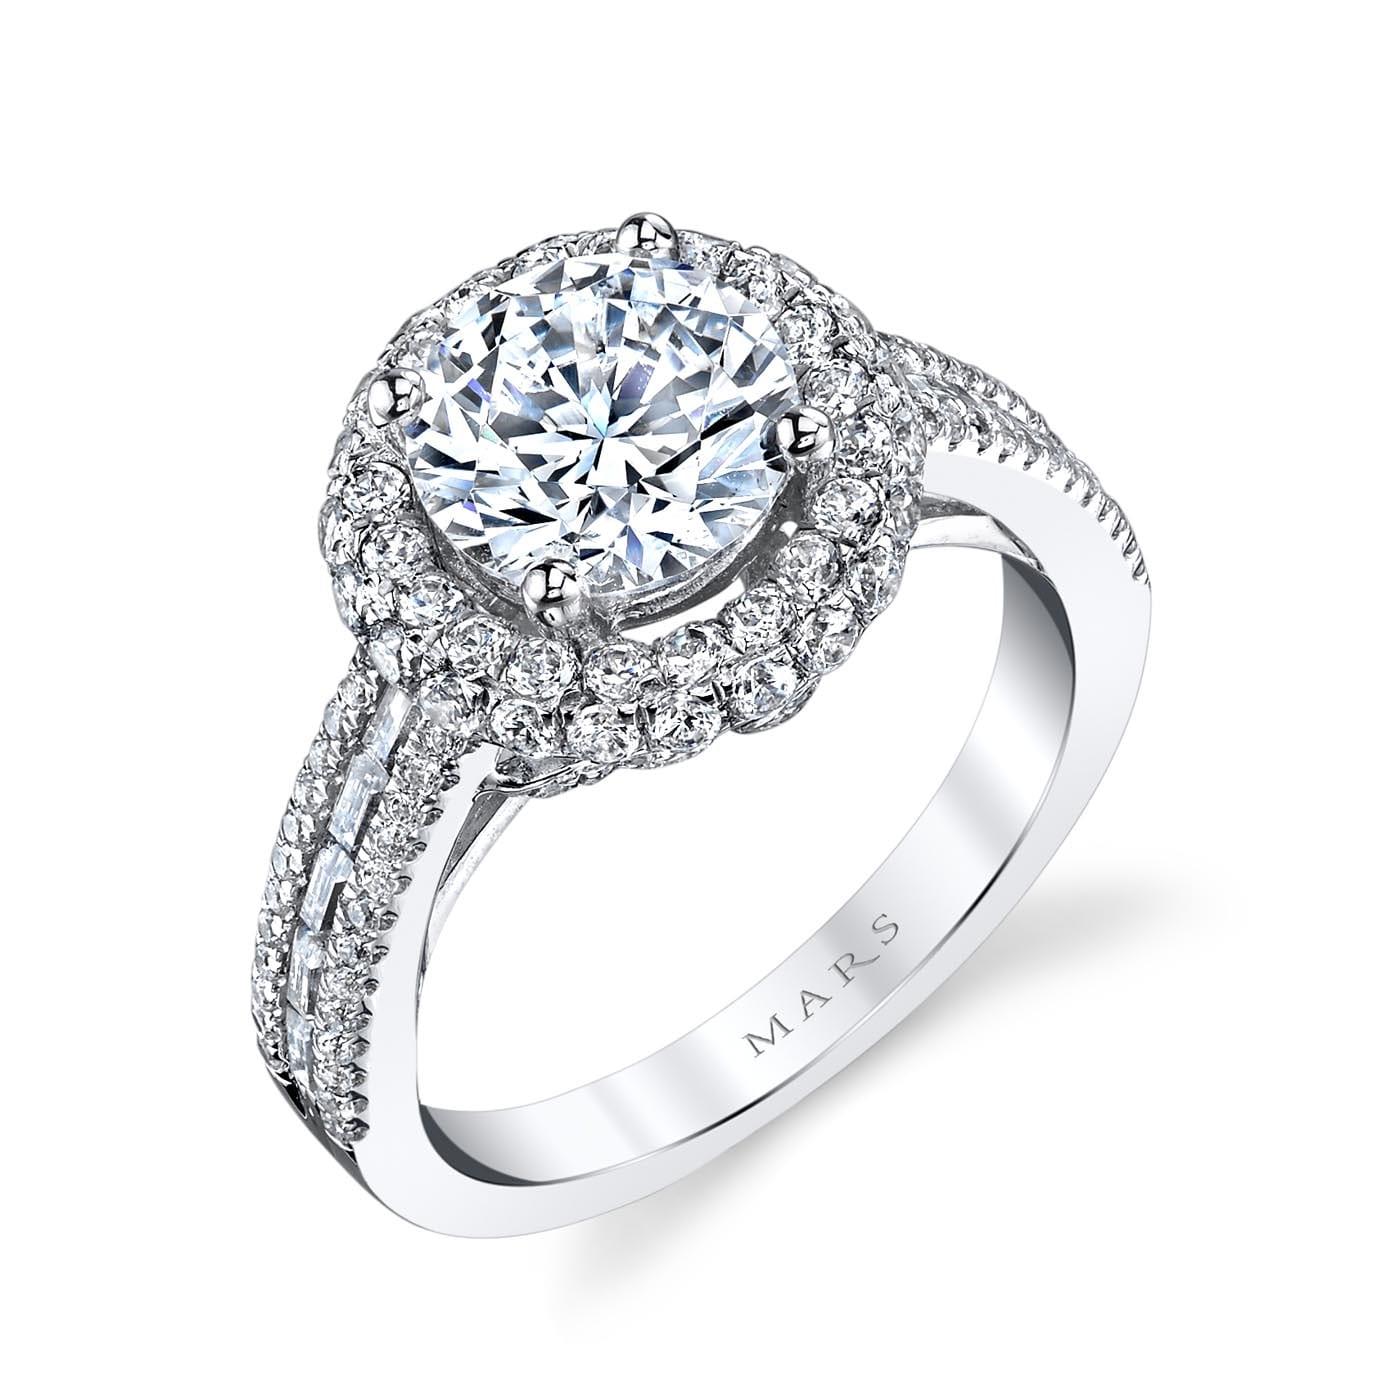 Halo Engagement RingStyle #: MARS 25637